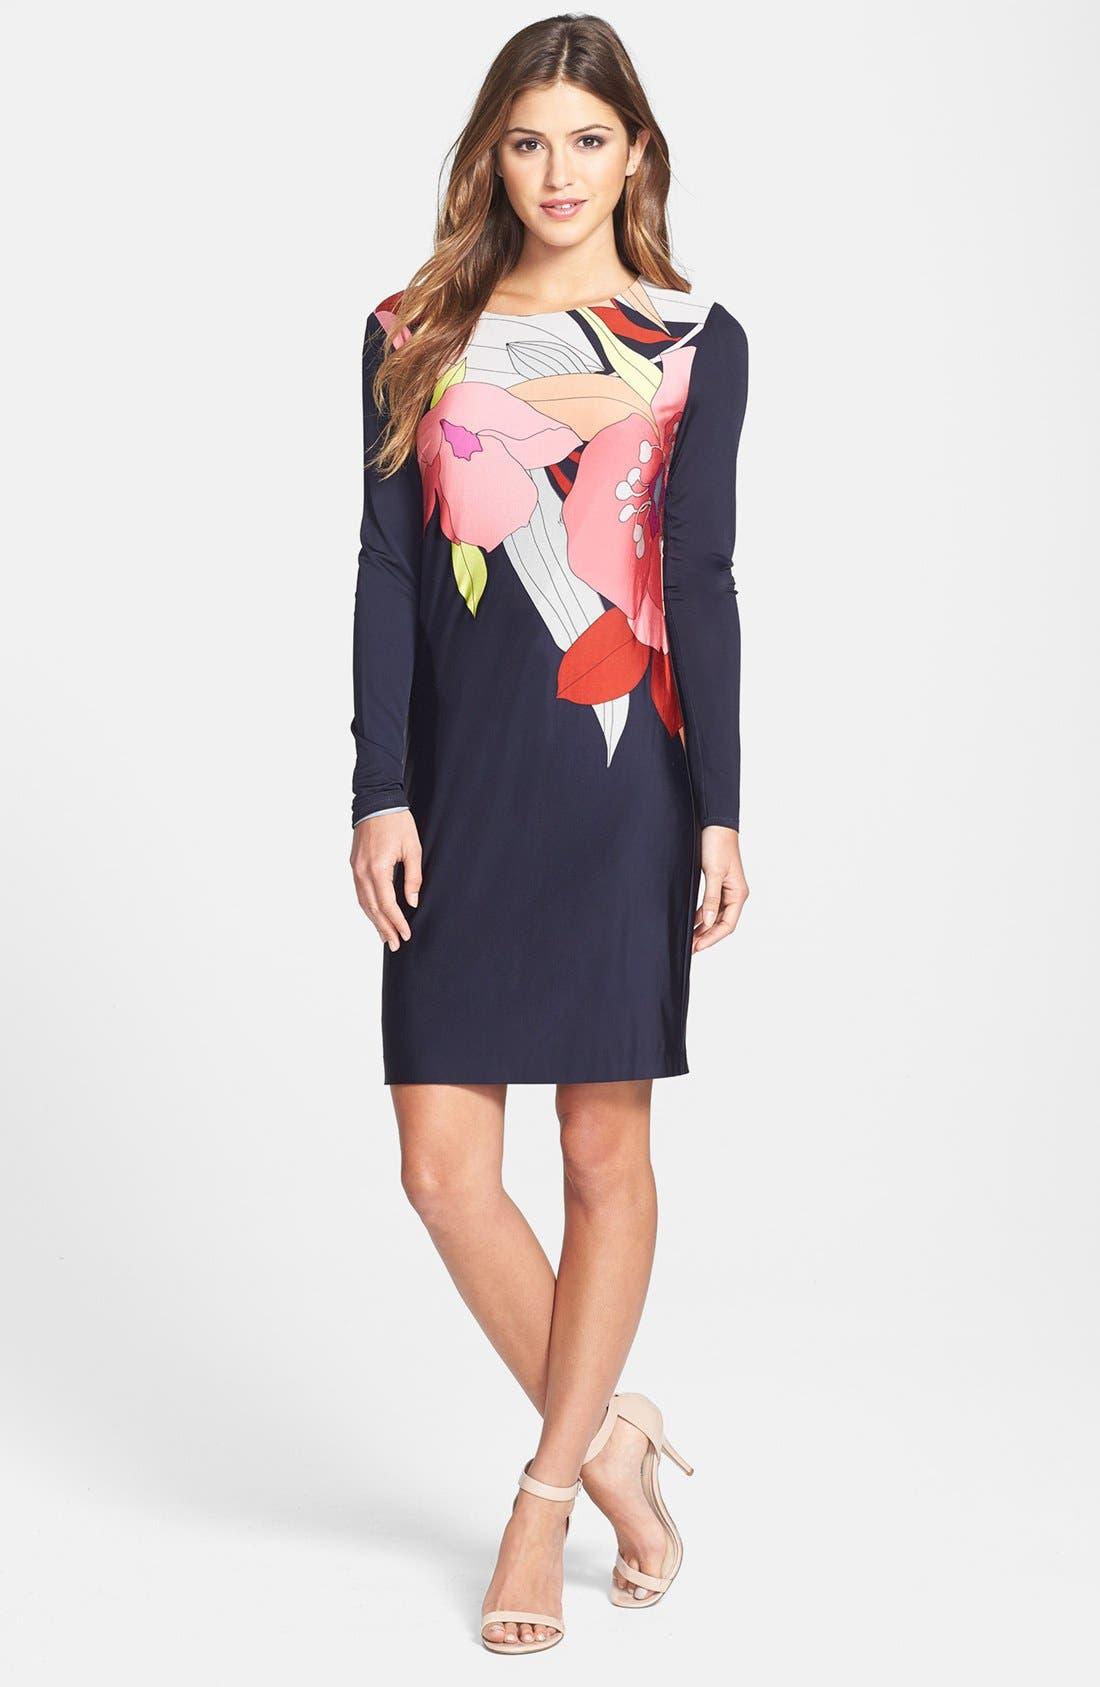 Alternate Image 1 Selected - Trina Turk 'Tahiti' Print Jersey Dress